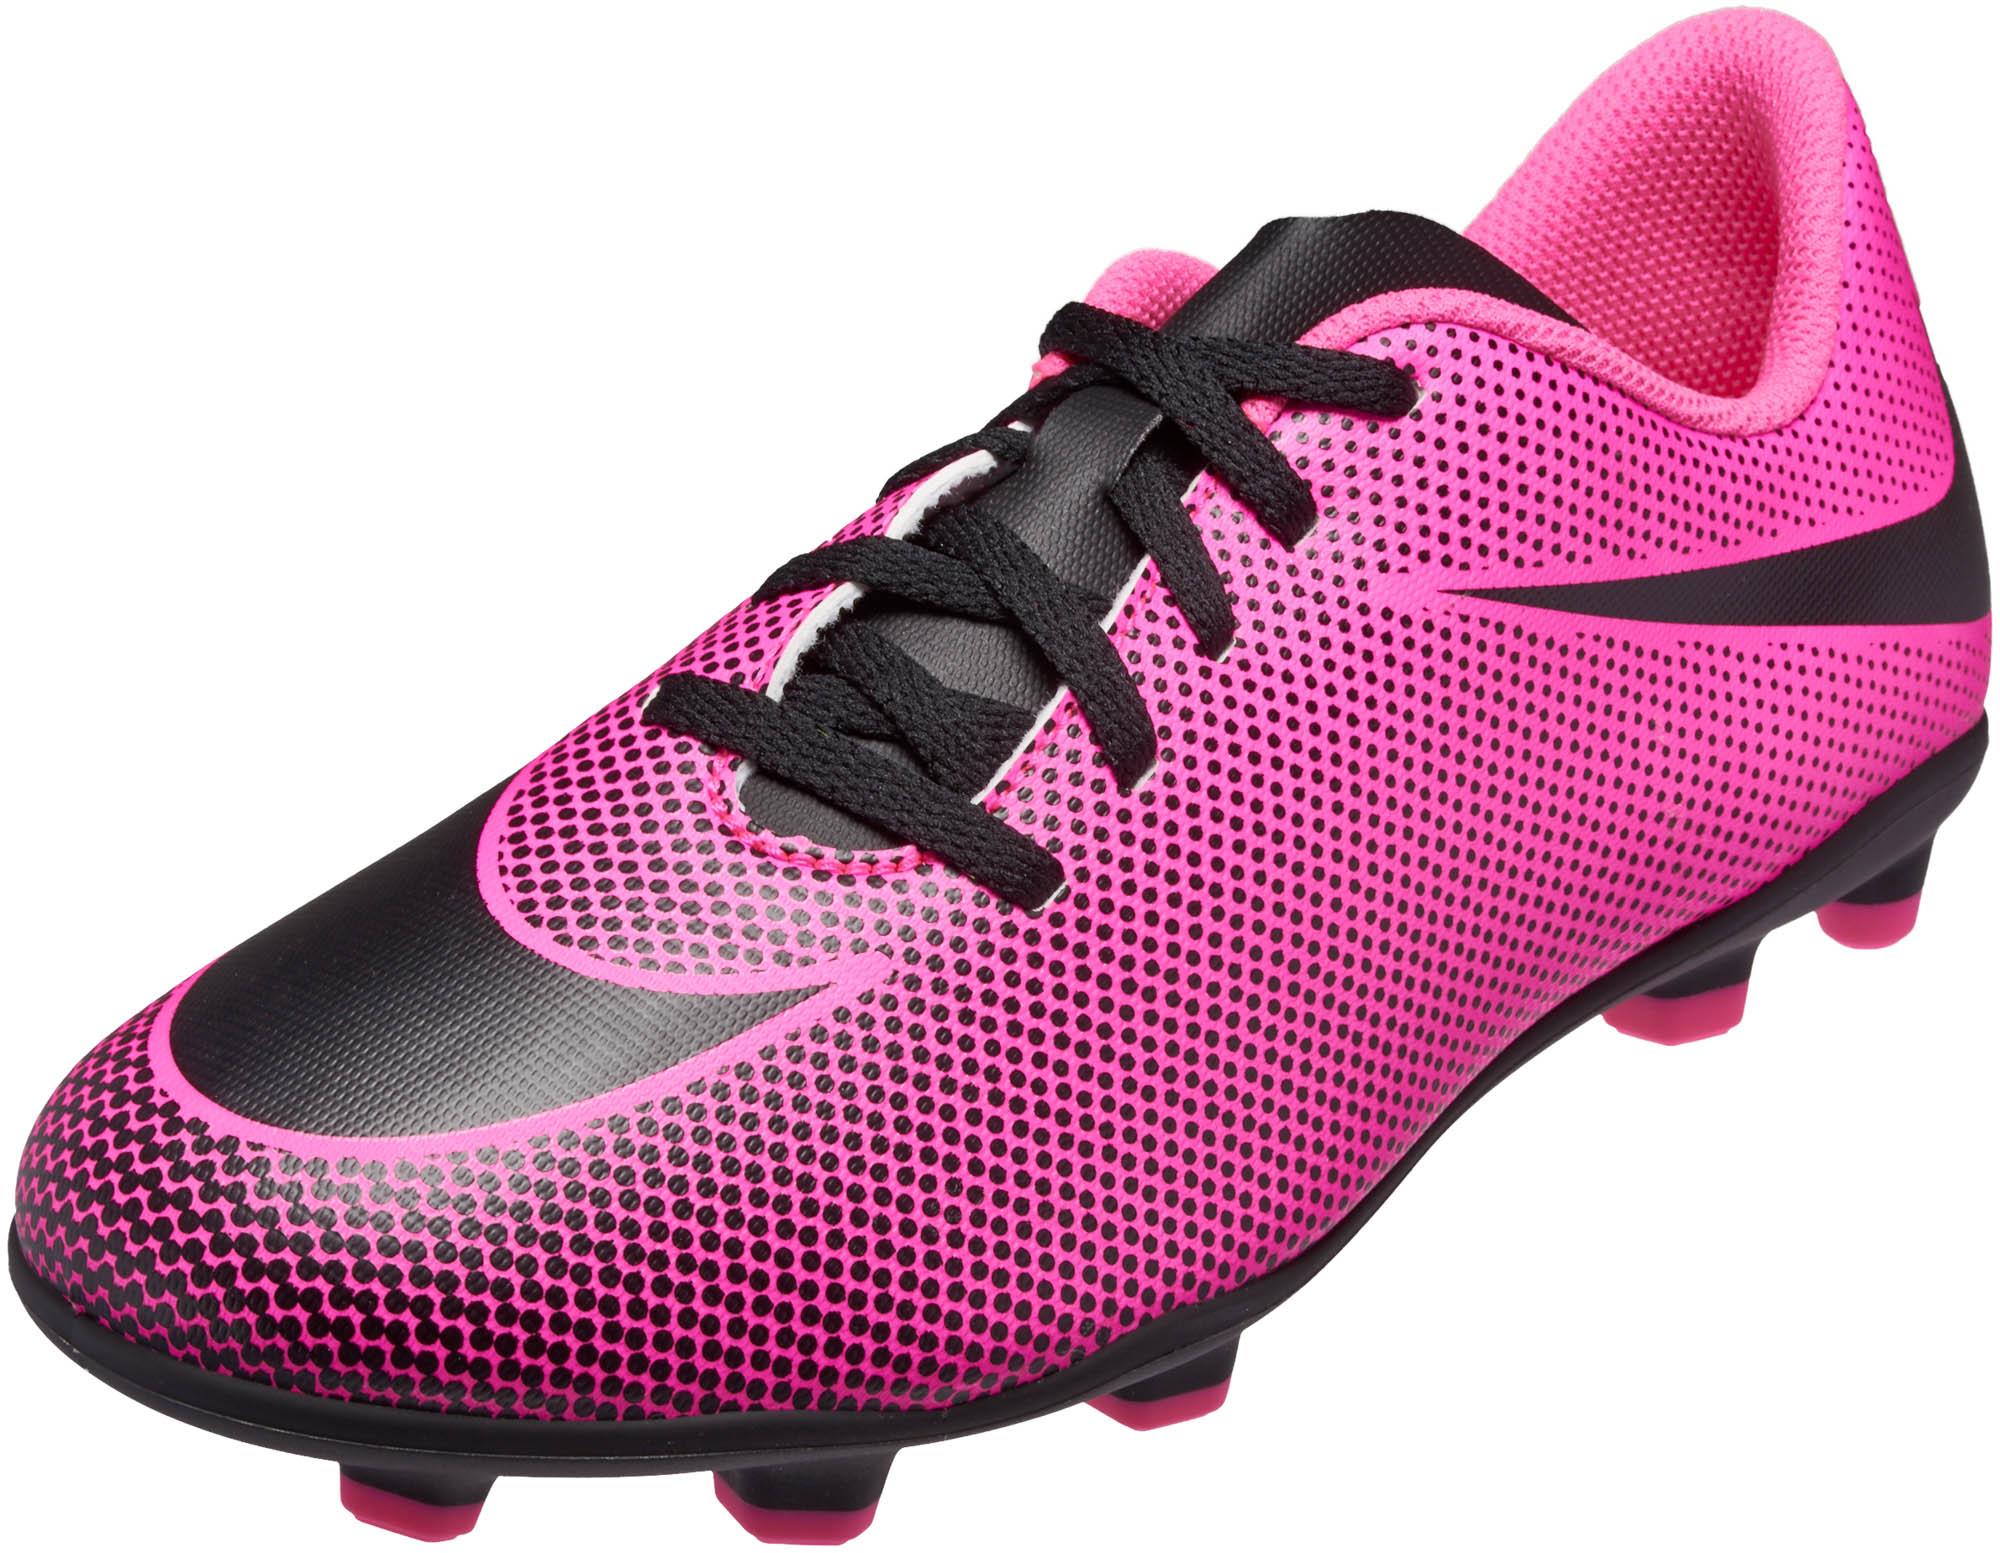 nike kids bravata ii fg soccer cleats pink blast amp black